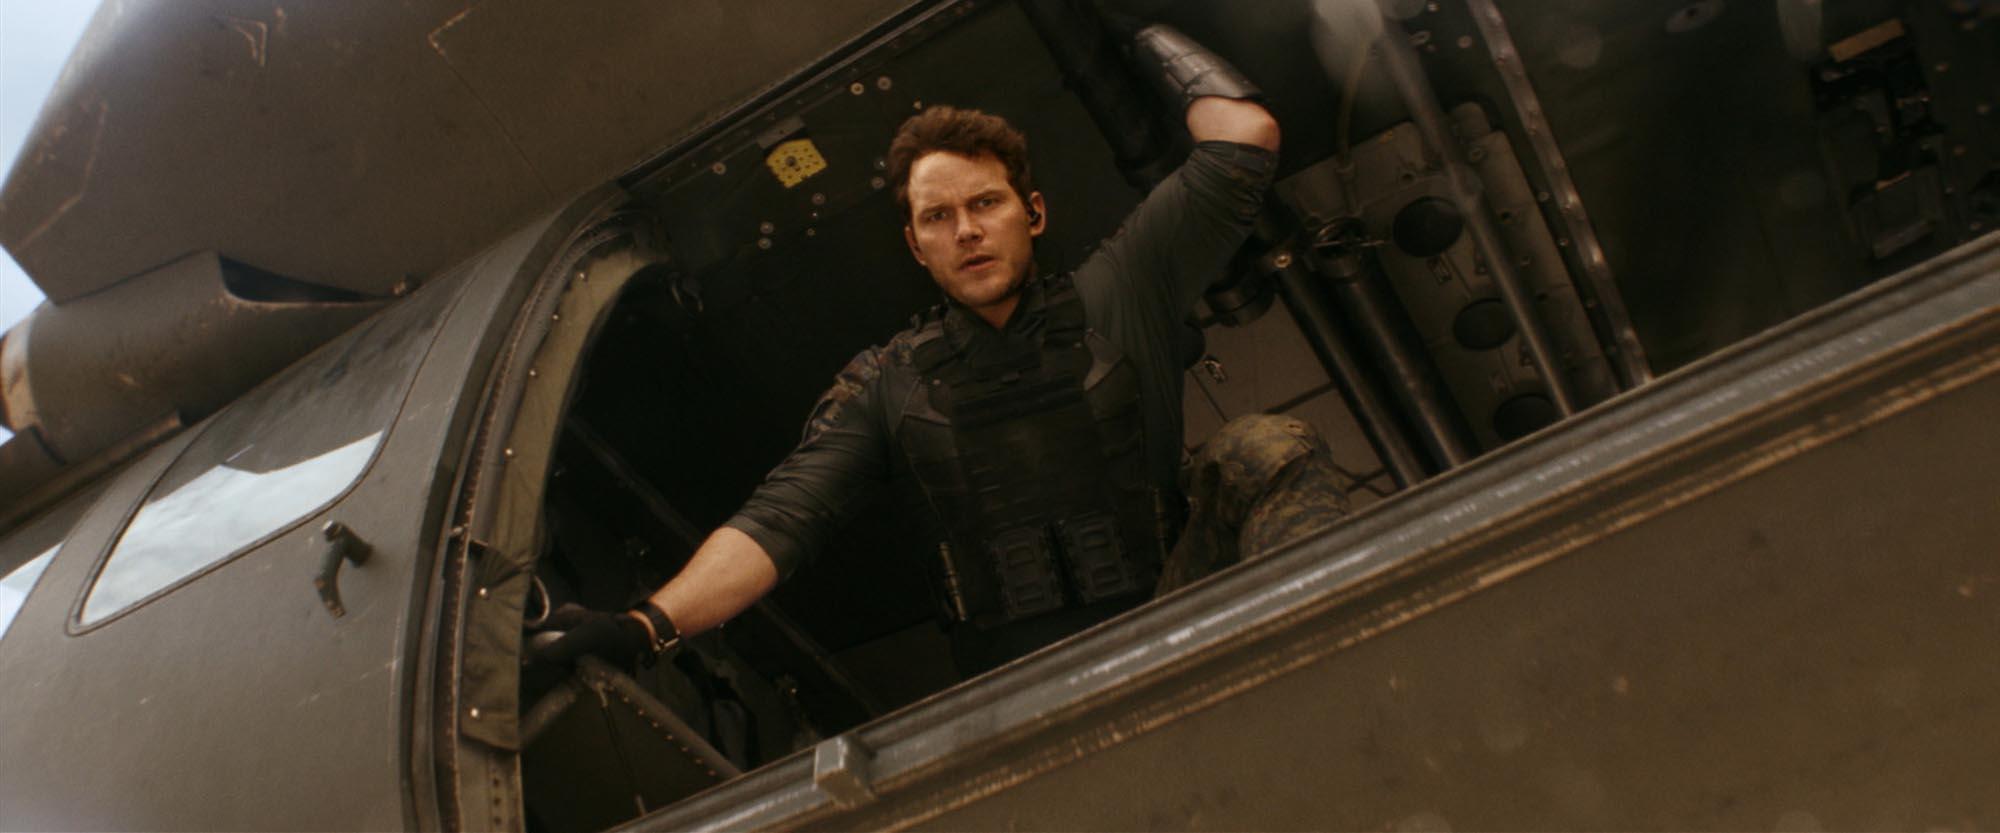 The Tomorrow War with Chris Pratt